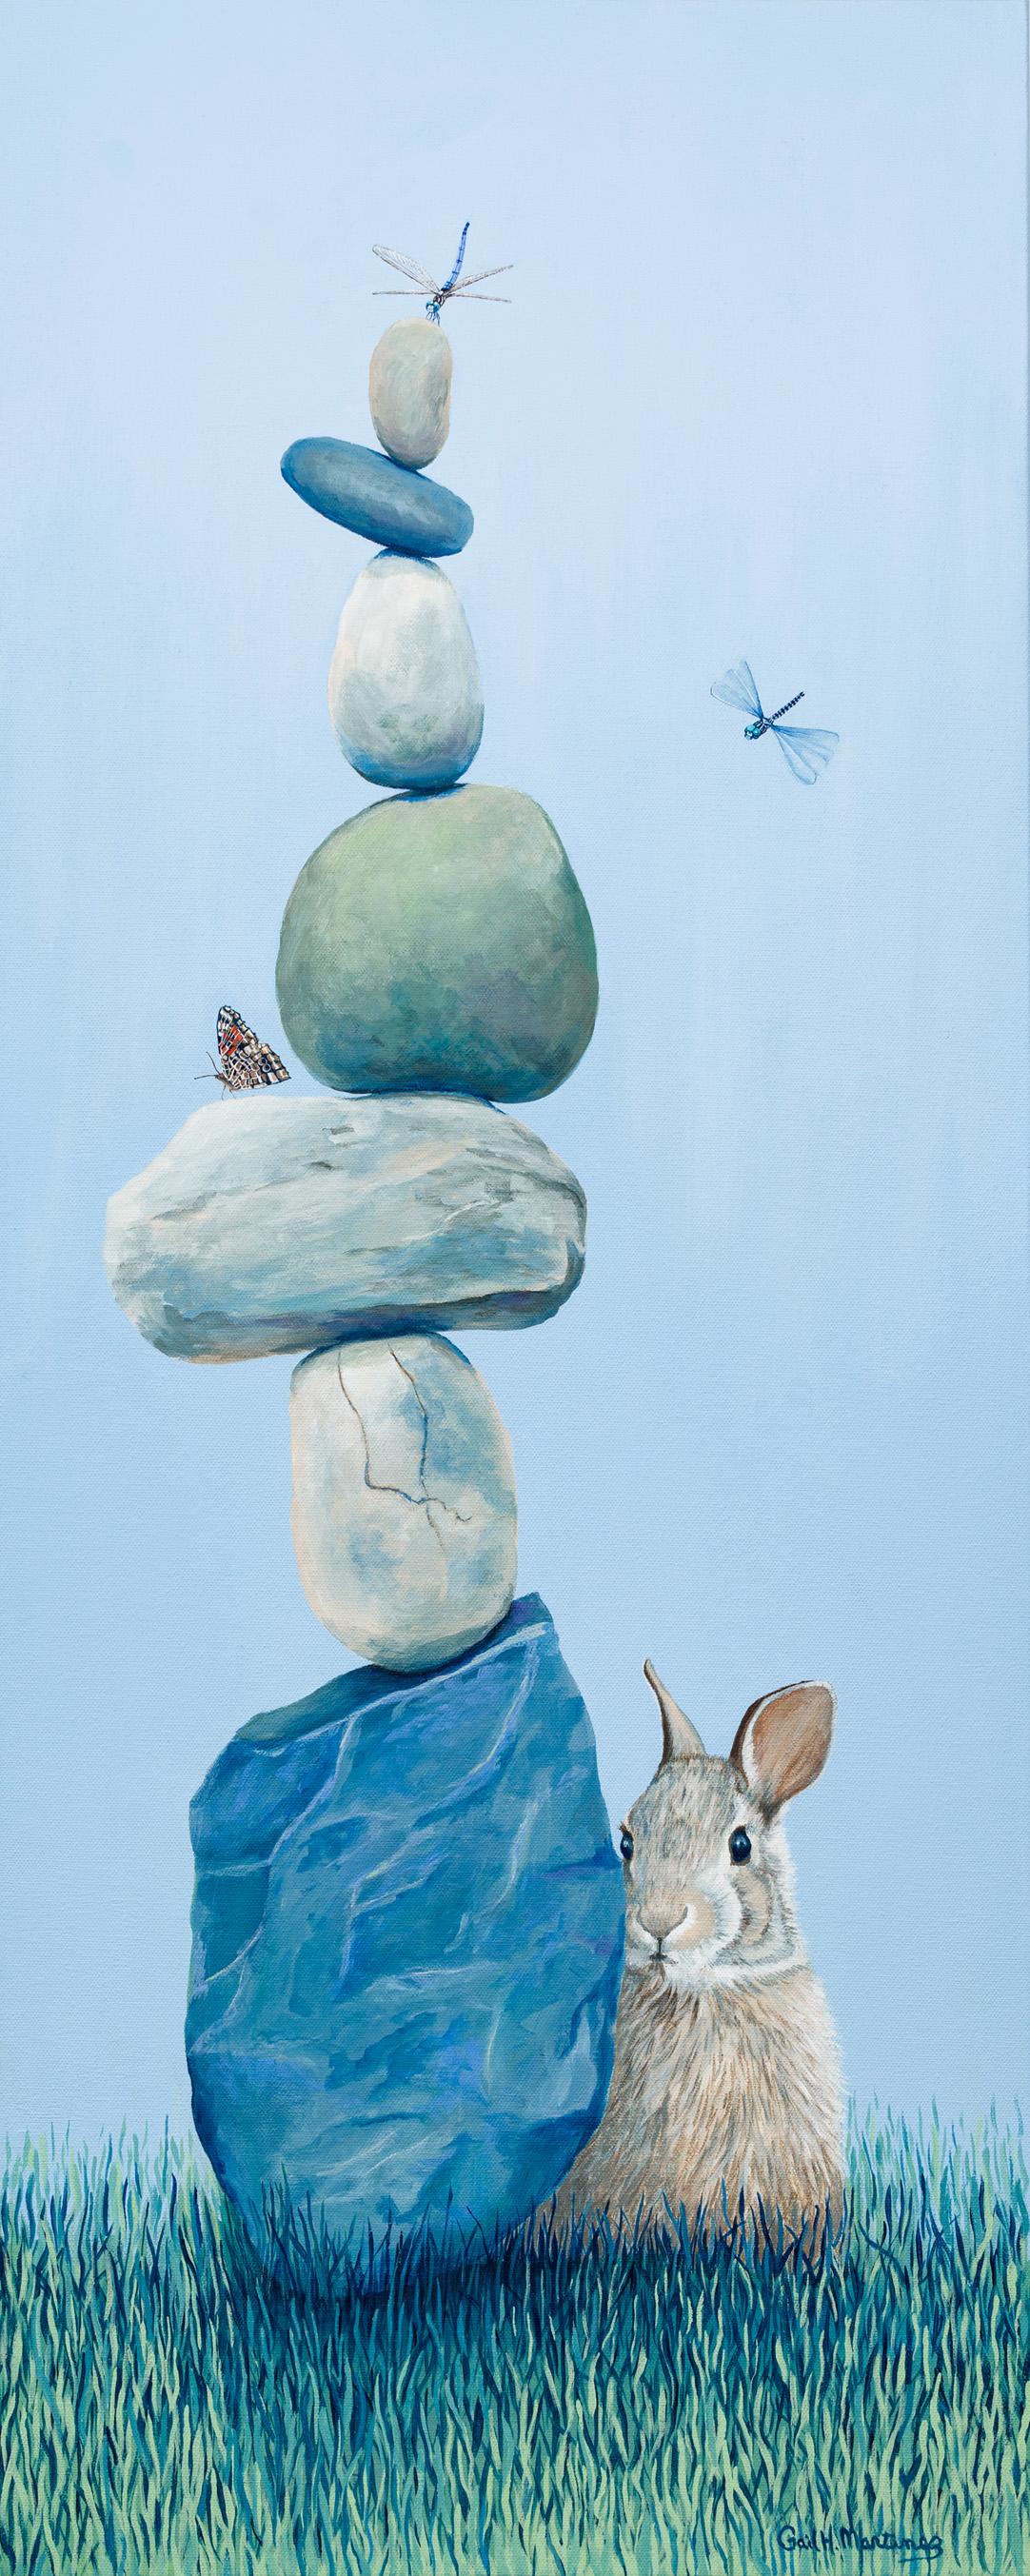 Balancing Act - Acrylic